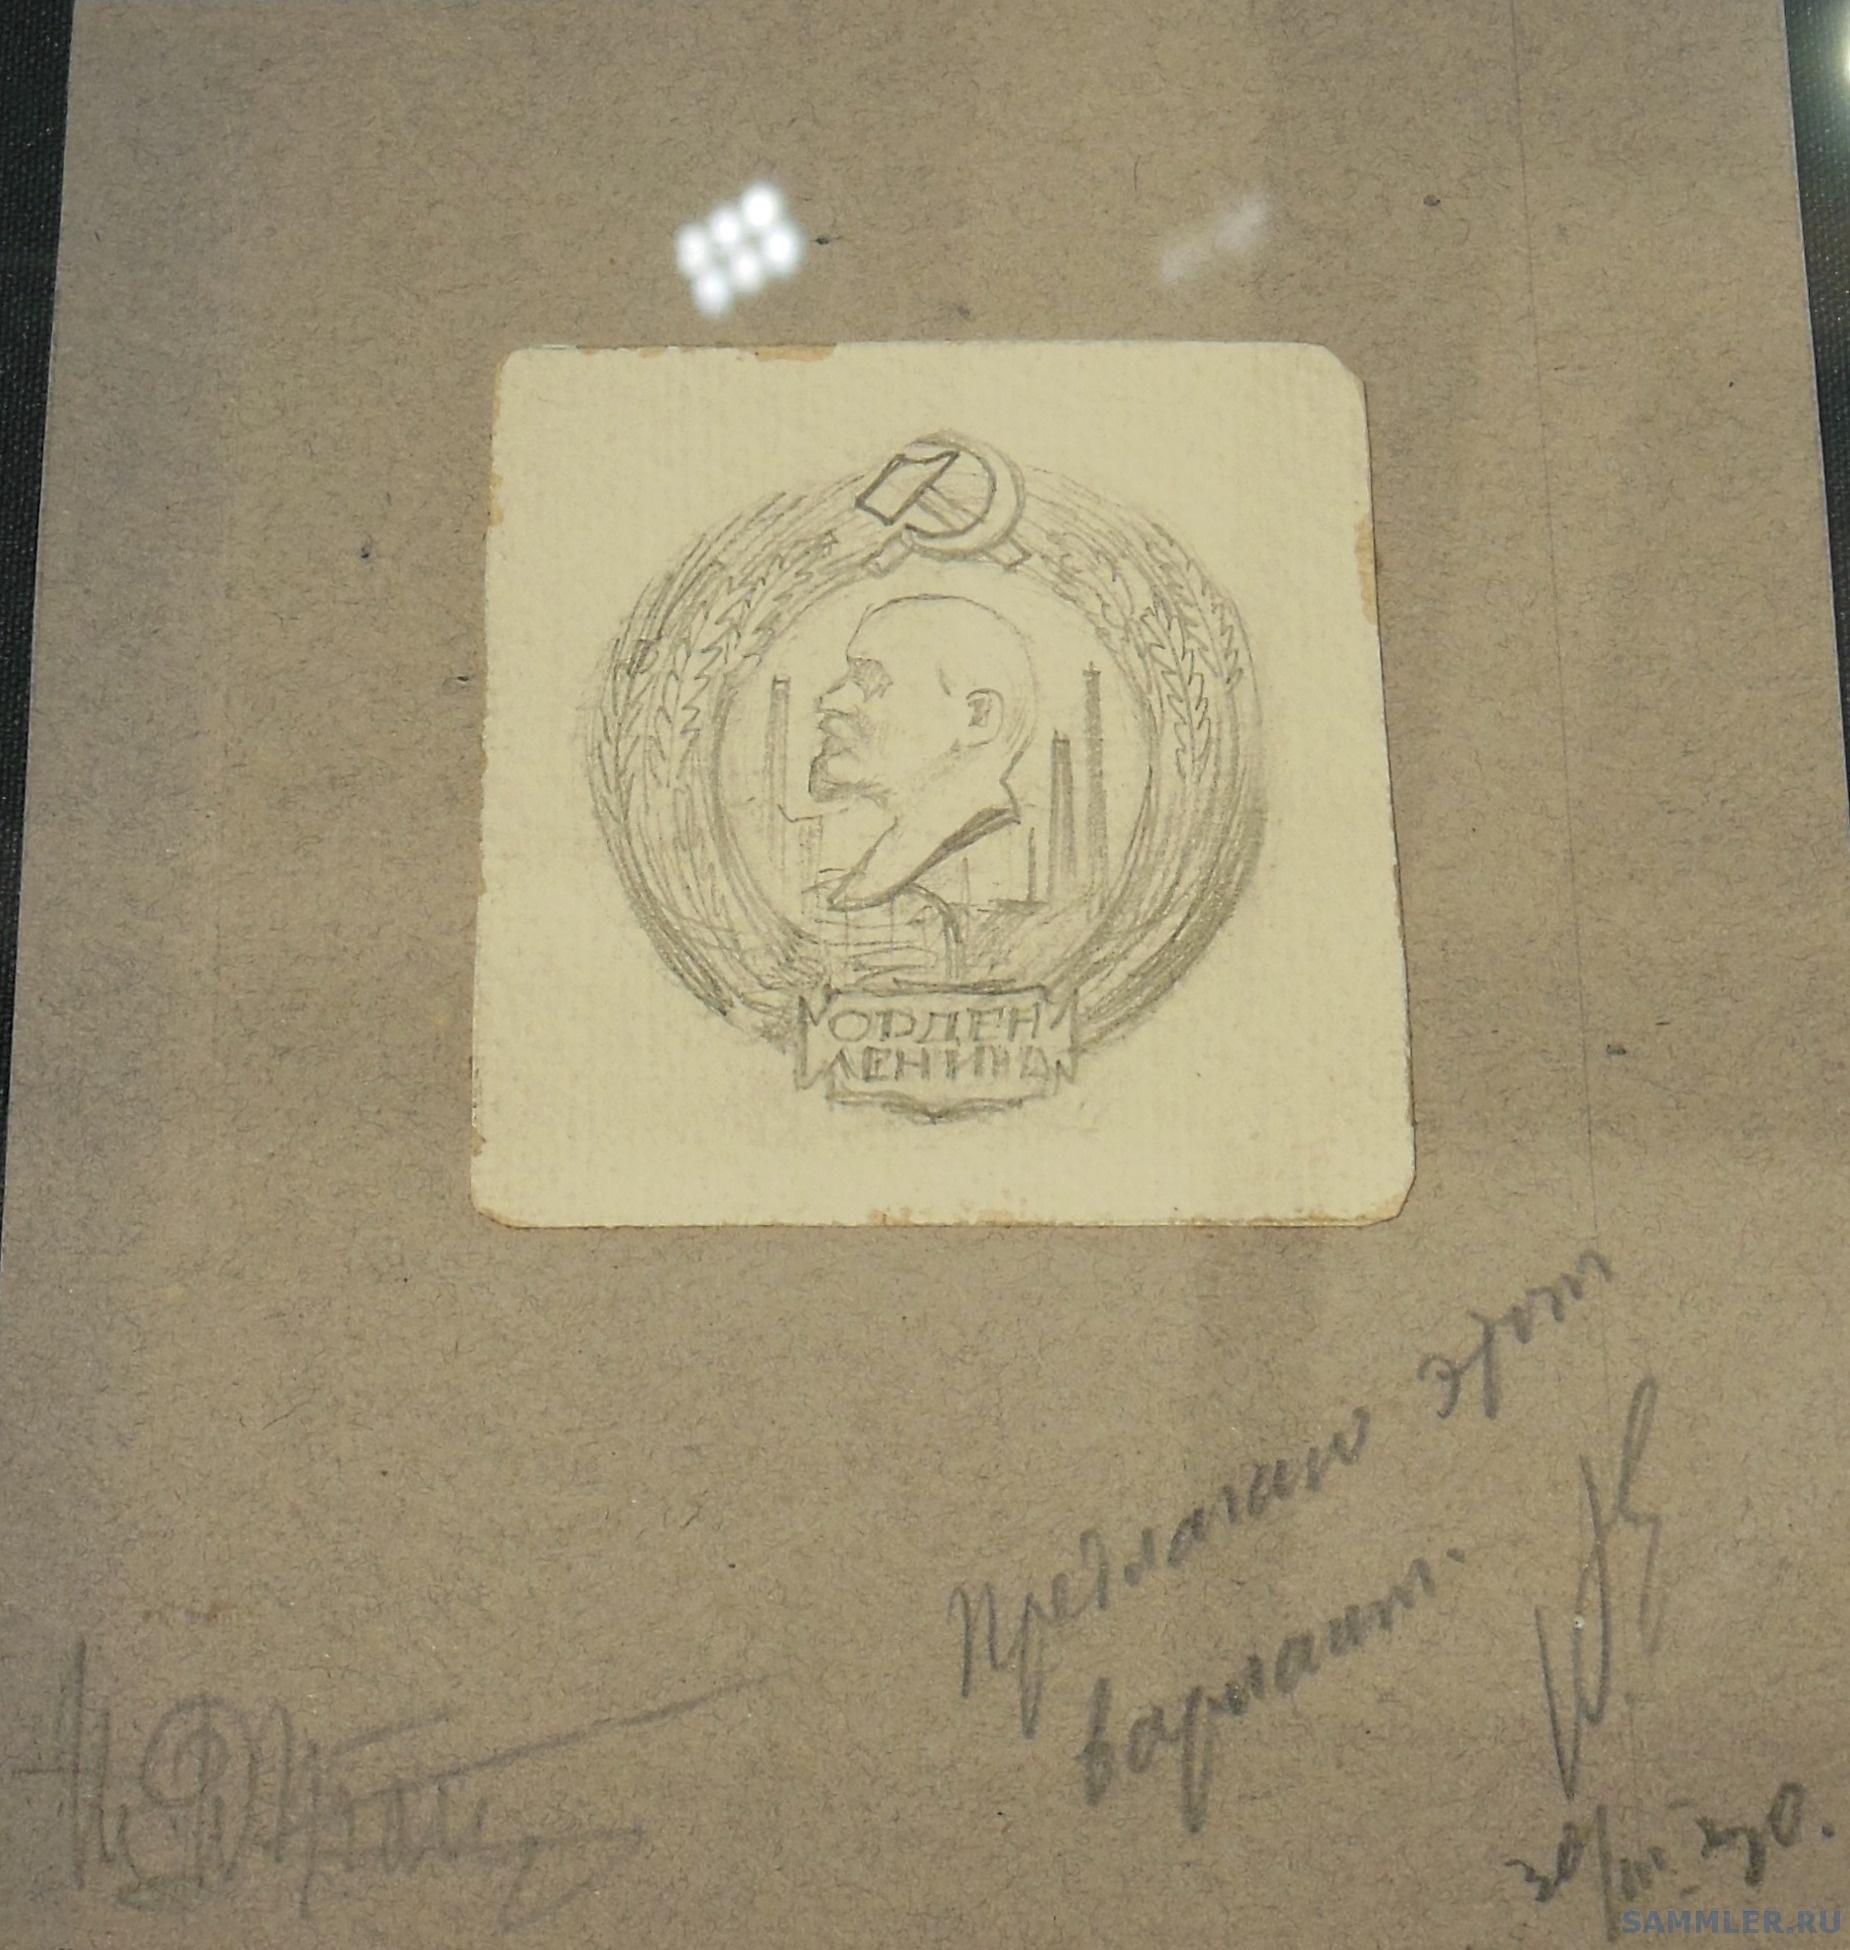 Проект ордена Ленина - И. И. Дубасов, утв. А. С. Енукидзе, 1930.JPG